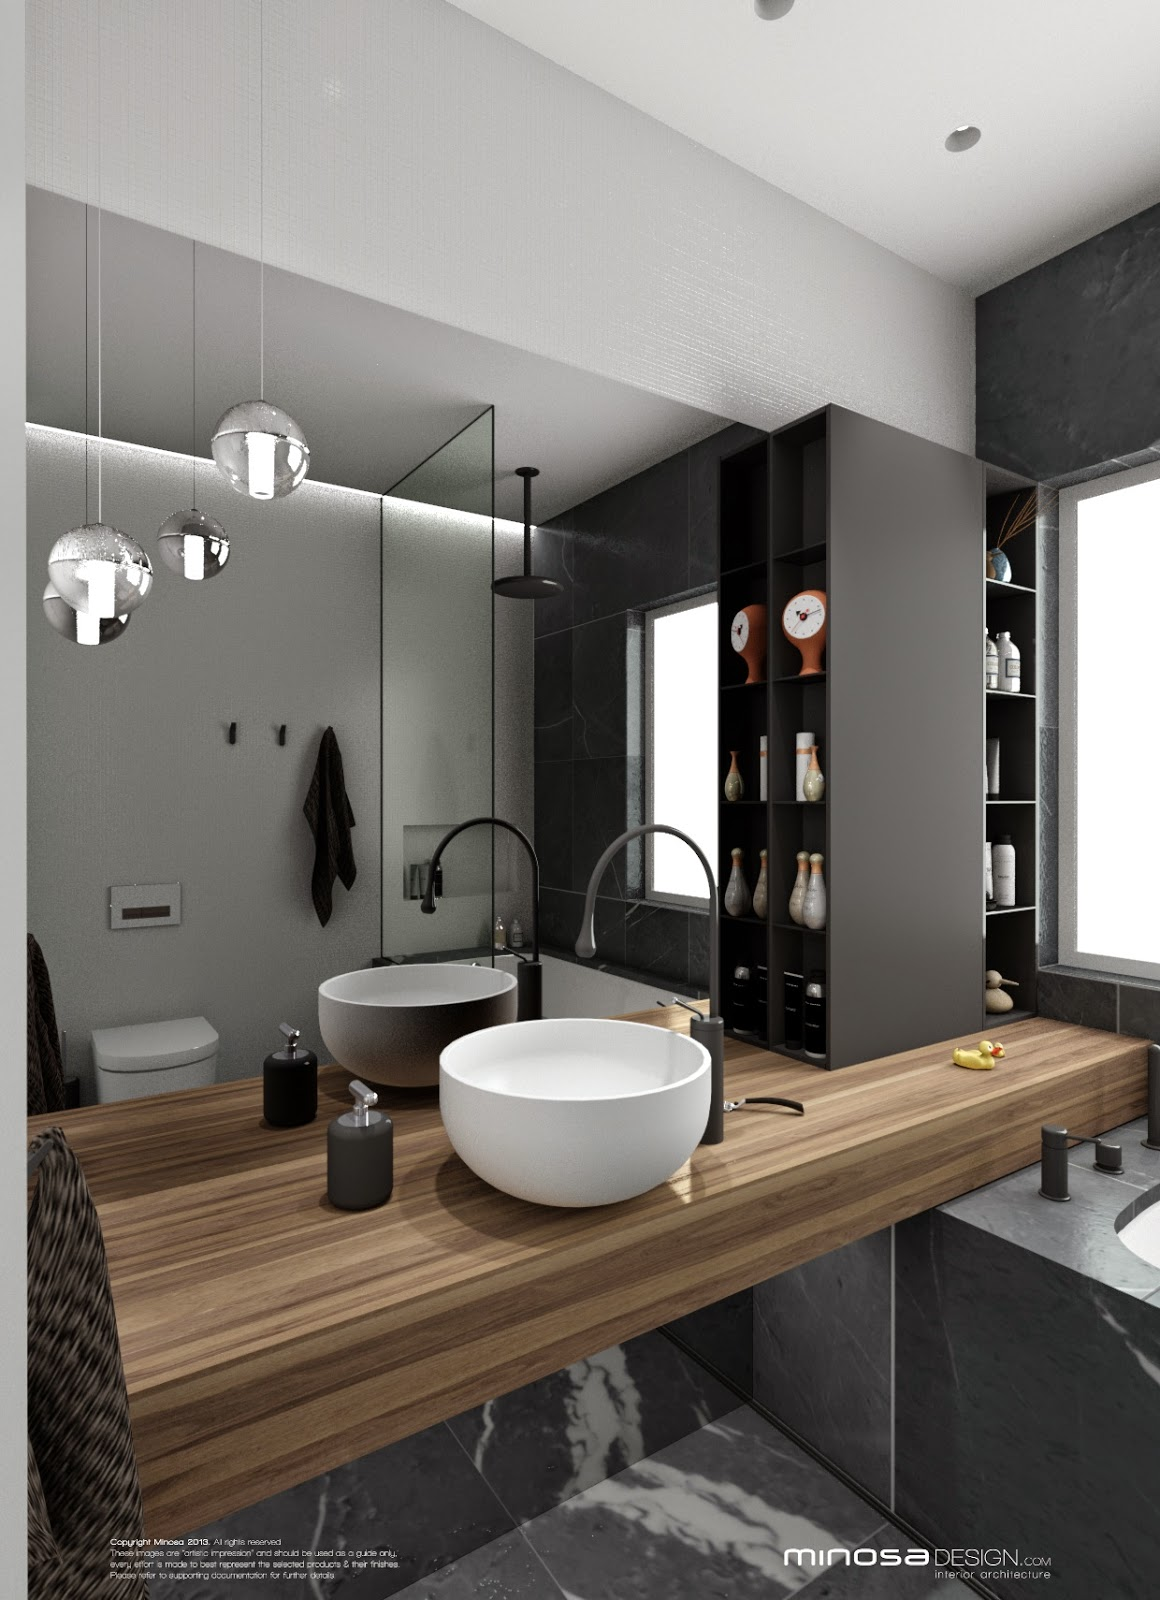 Minosa: Bathroom Design